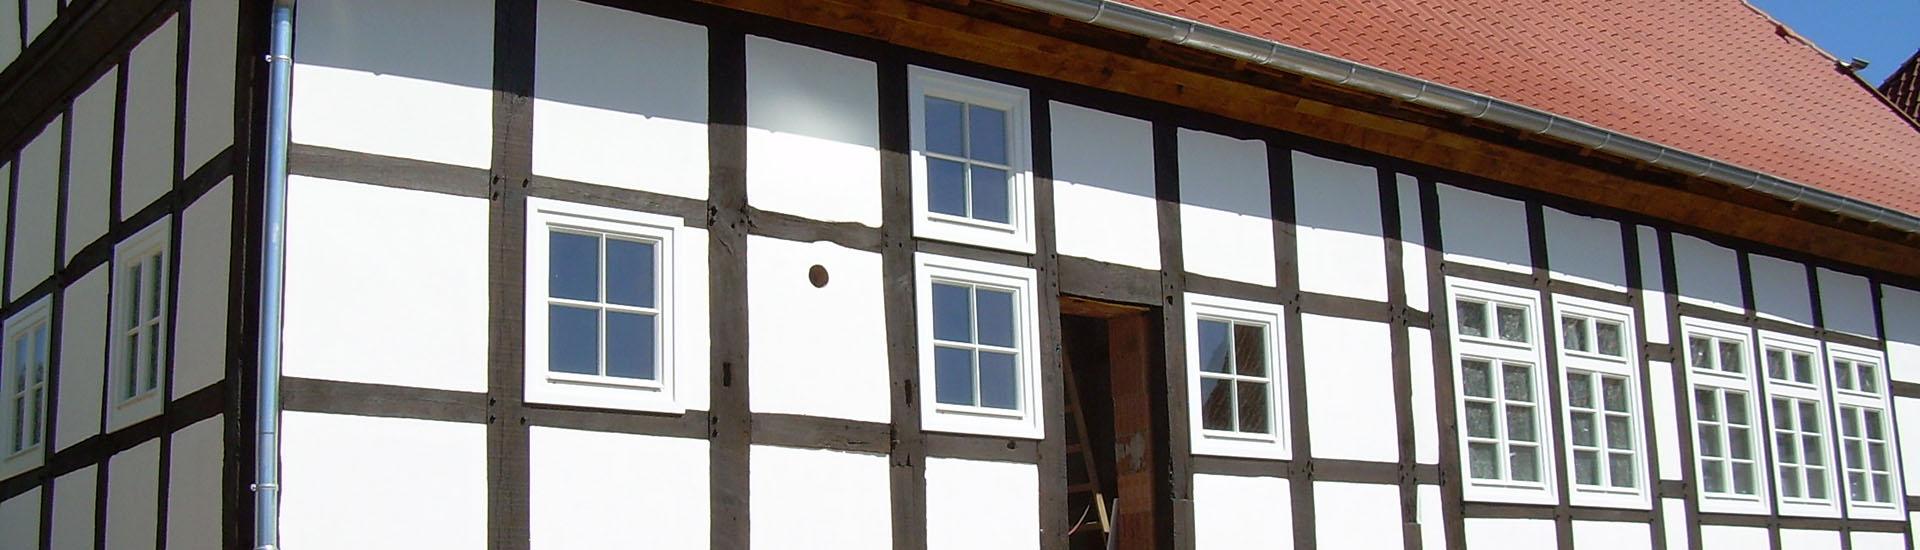 ZHG Holz & Dach Fachwerk